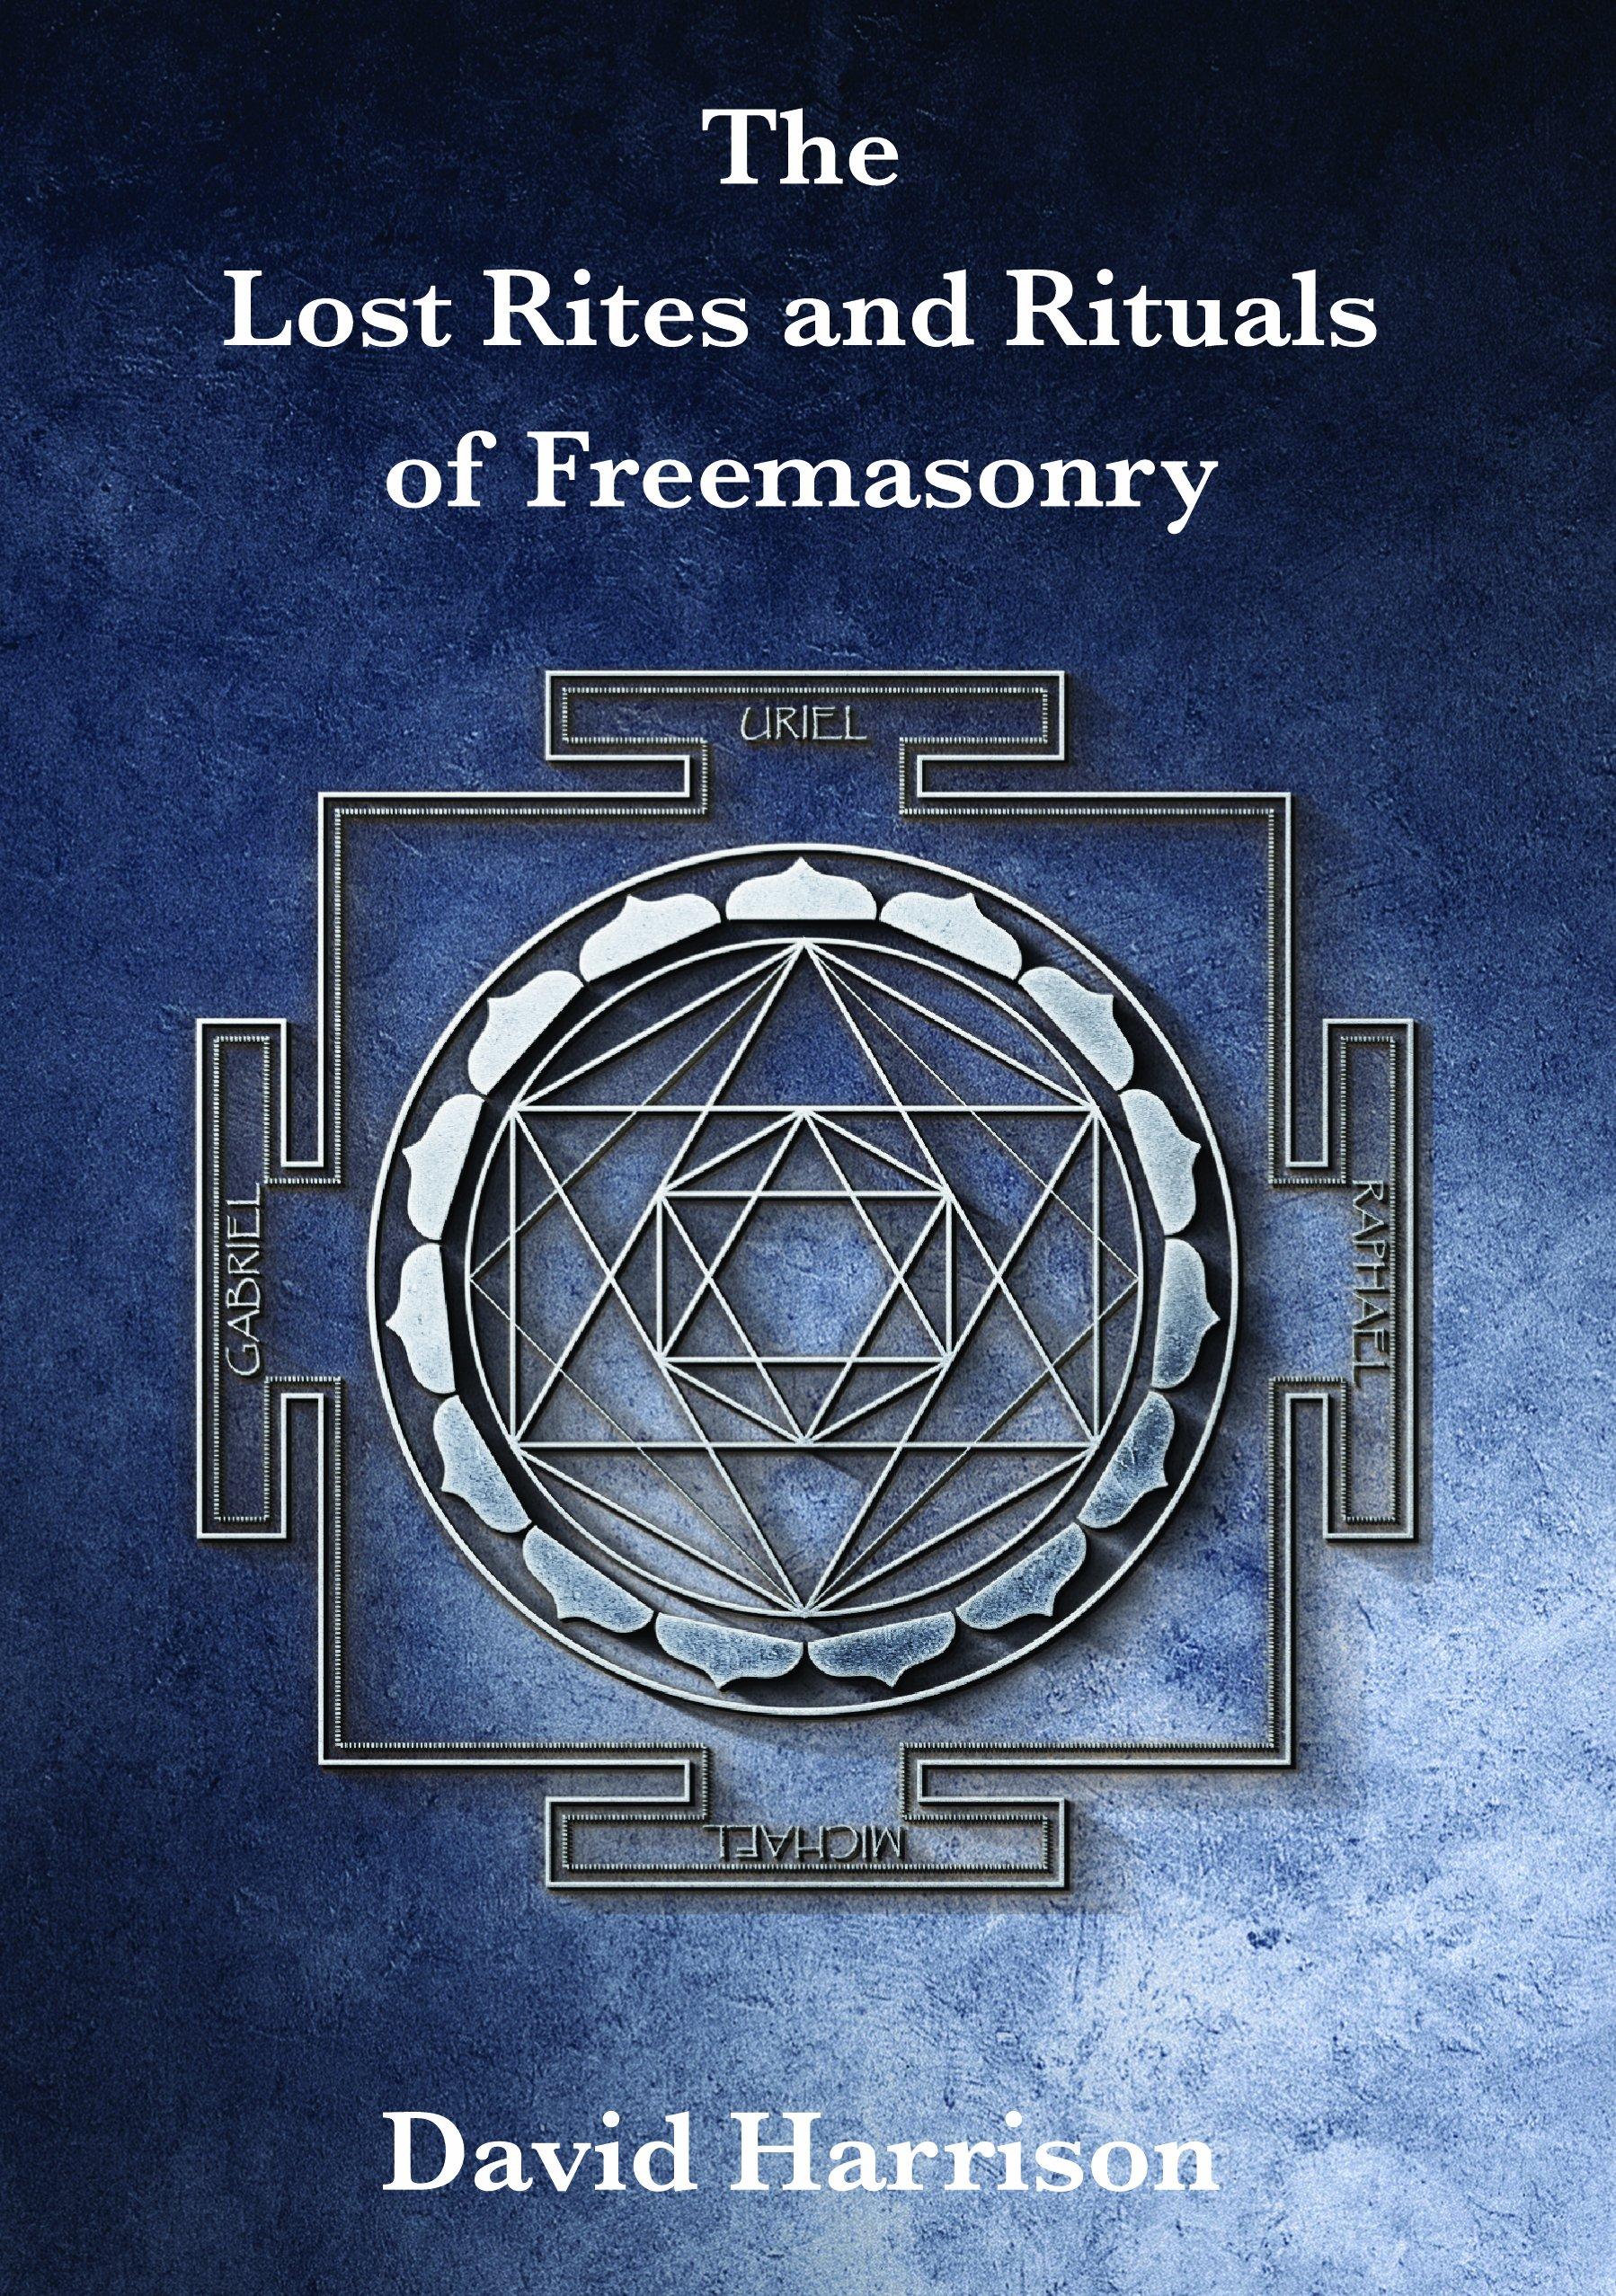 The Lost Rites And Rituals Of Freemasonry David Harrison